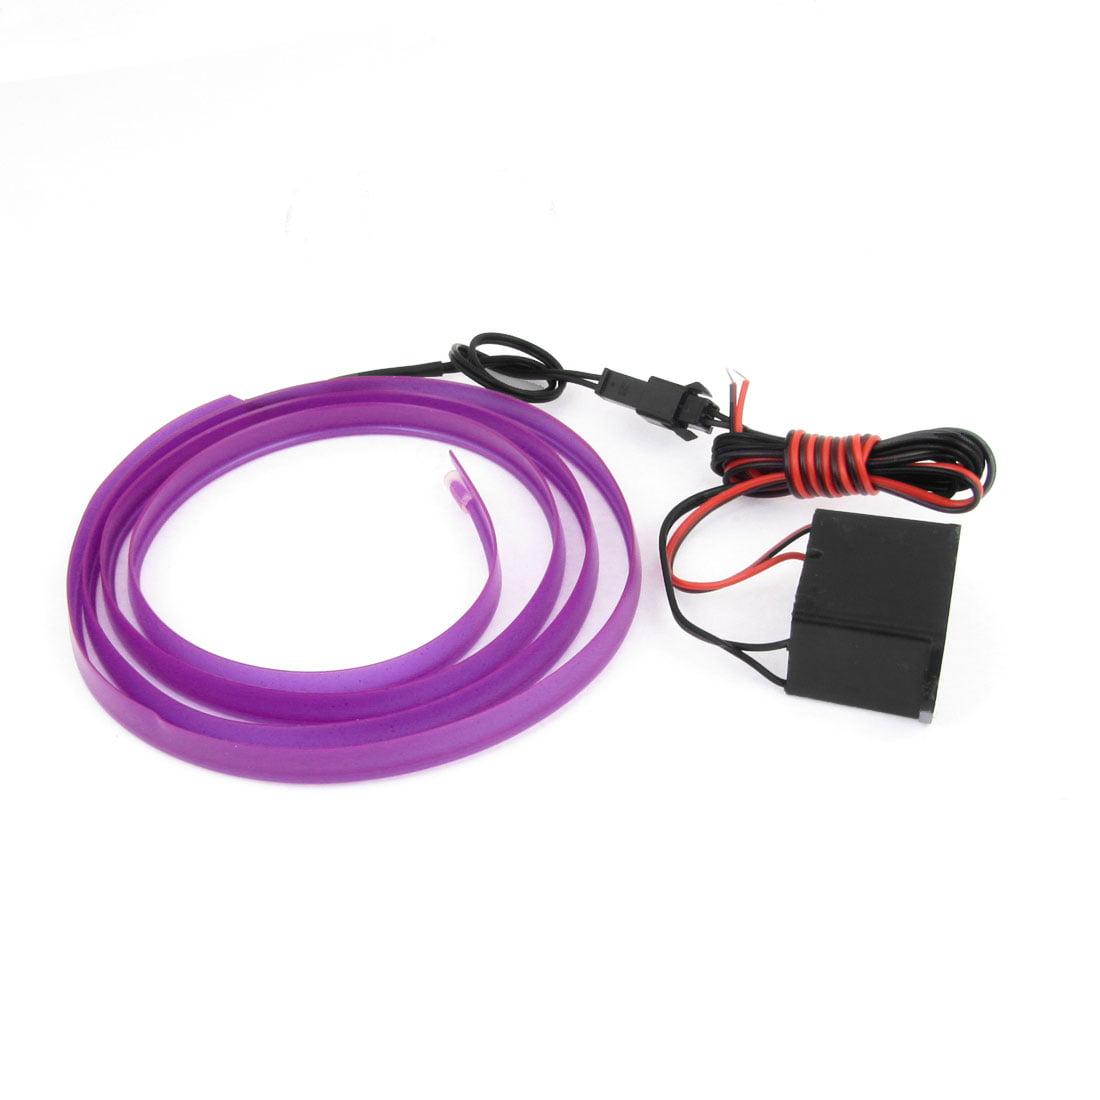 Purple 1M Sewable EL Wire Neon Glow Light Rope Sew Tag Strip w Controller